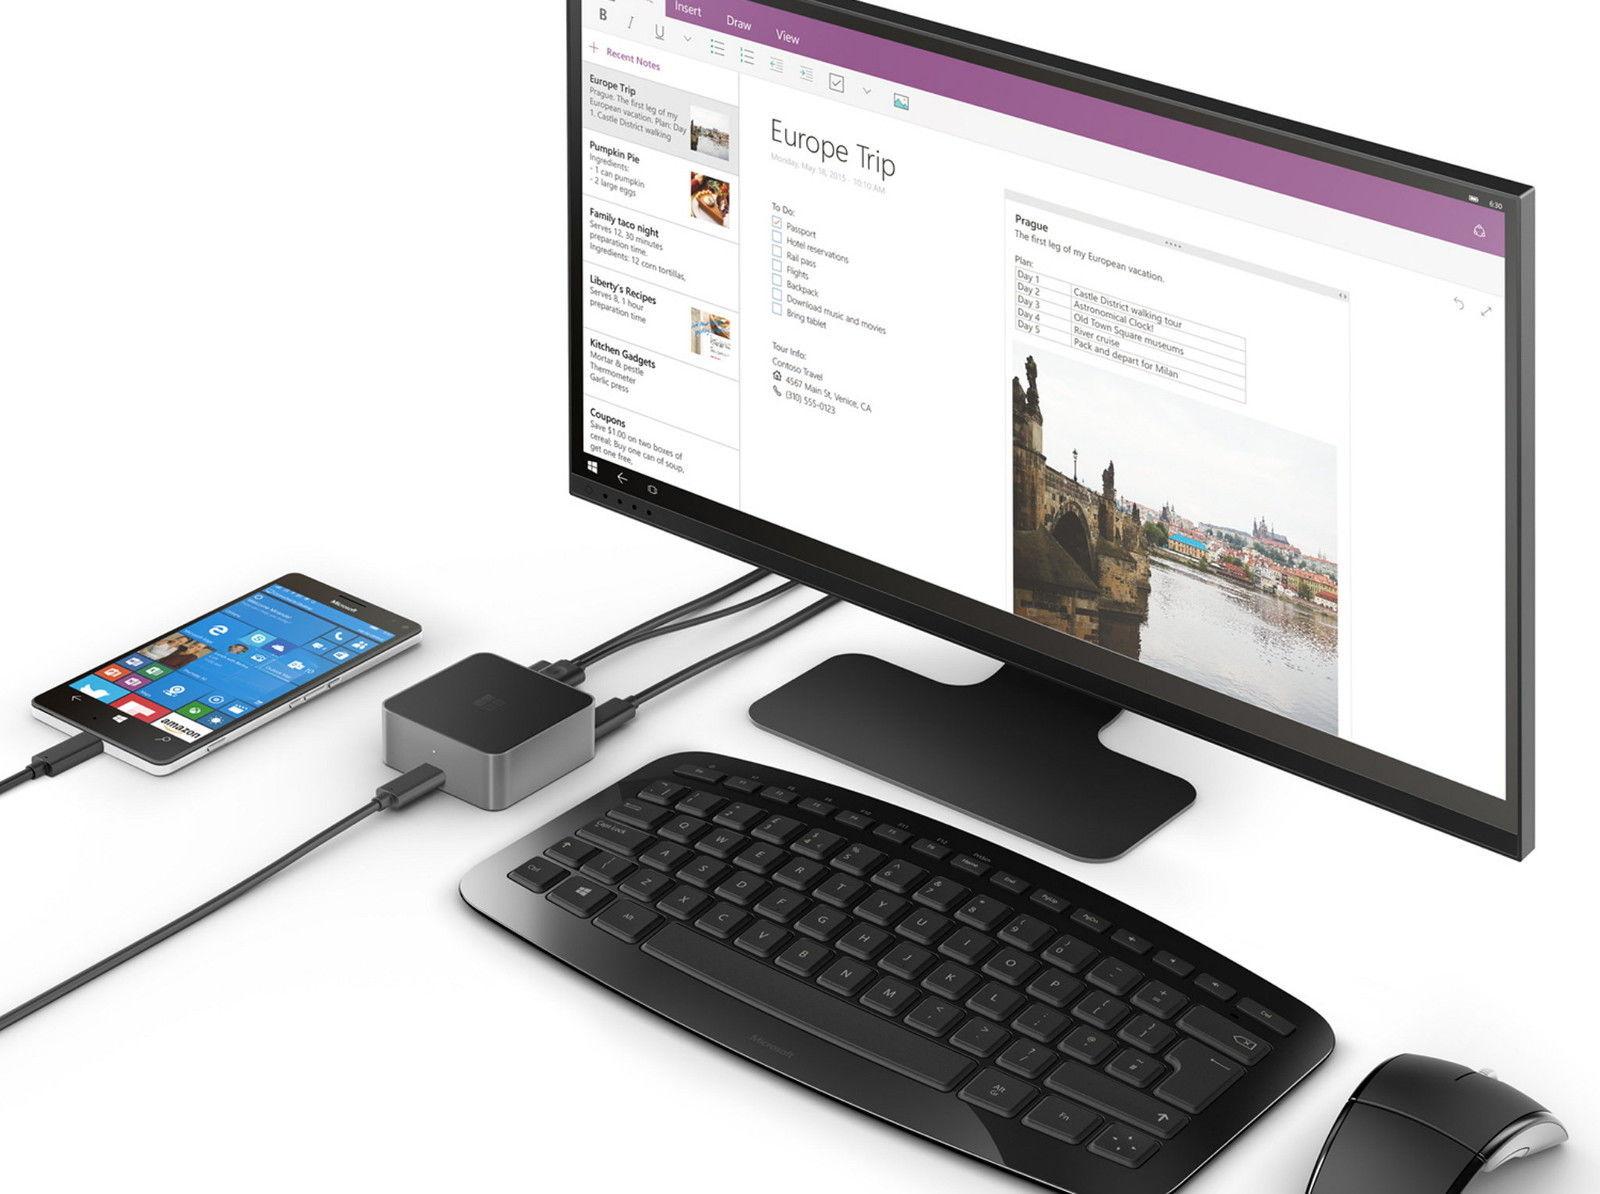 Microsoft-Display-Dock-continuum.jpg